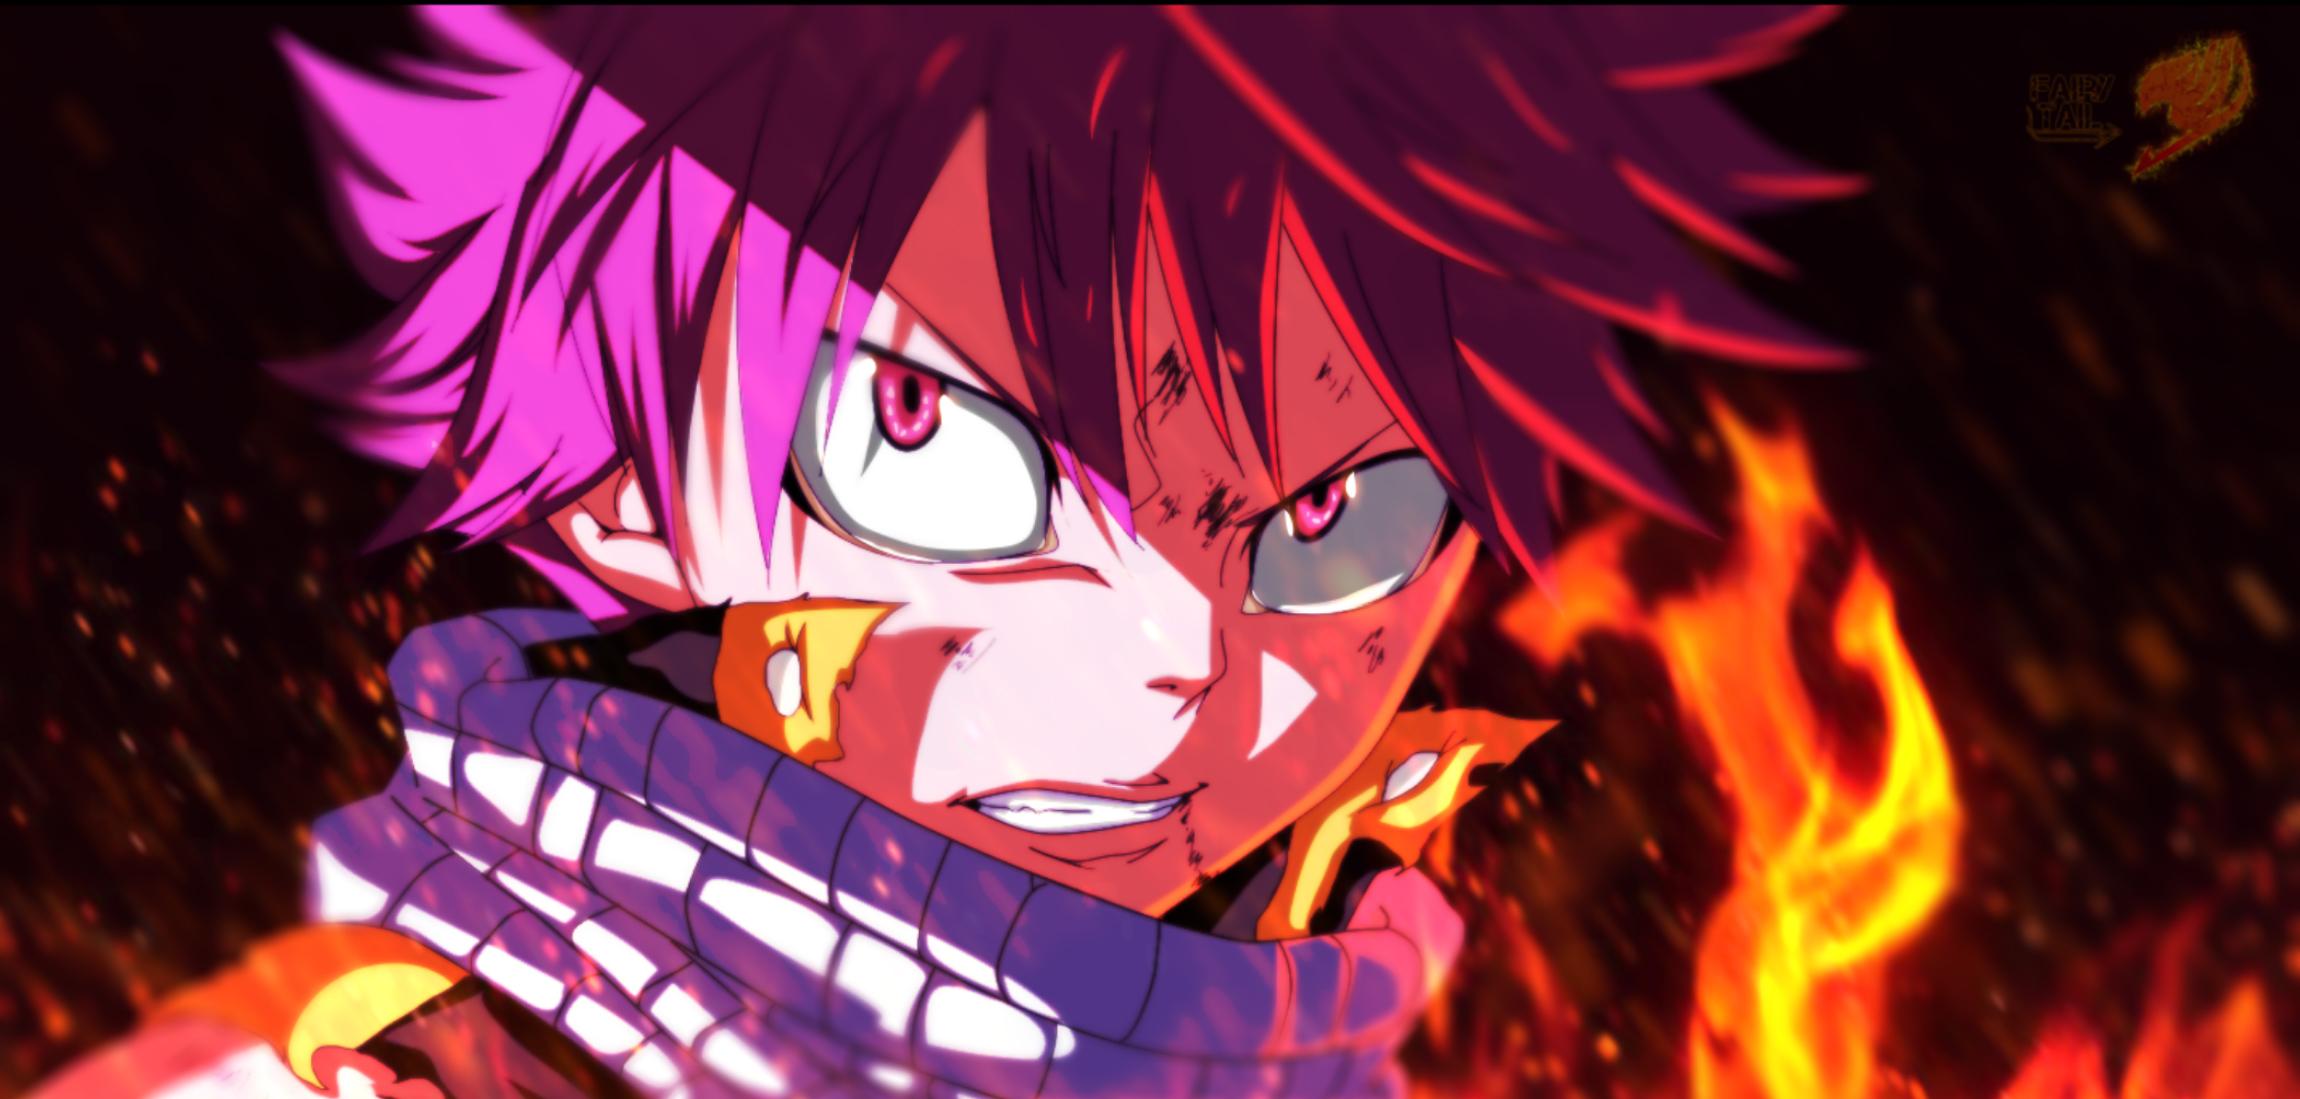 Natsu Dragneel, HD Anime, 4k Wallpapers, Images ...